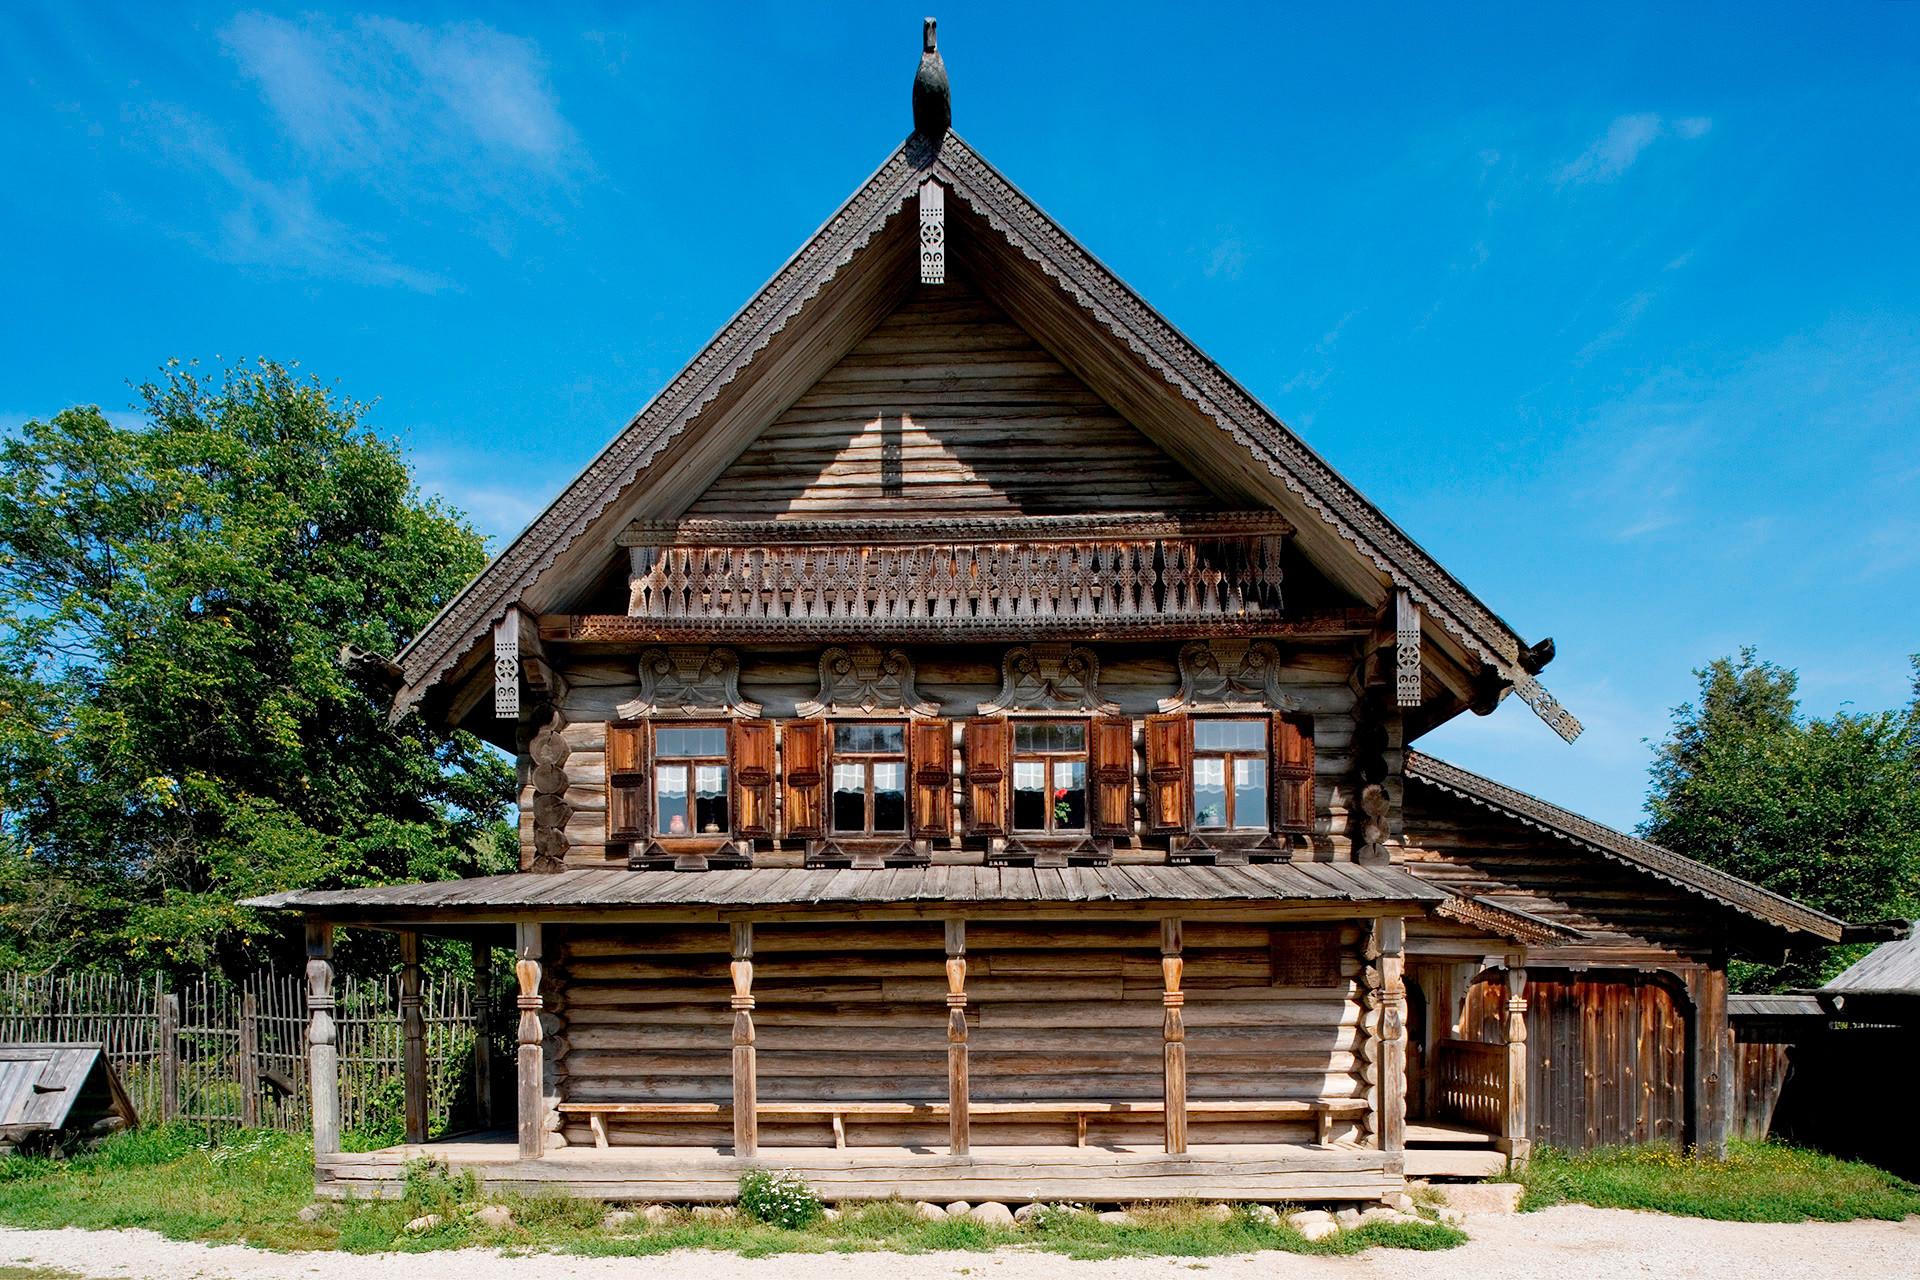 sept types de demeures traditionnelles russes russia beyond fr. Black Bedroom Furniture Sets. Home Design Ideas